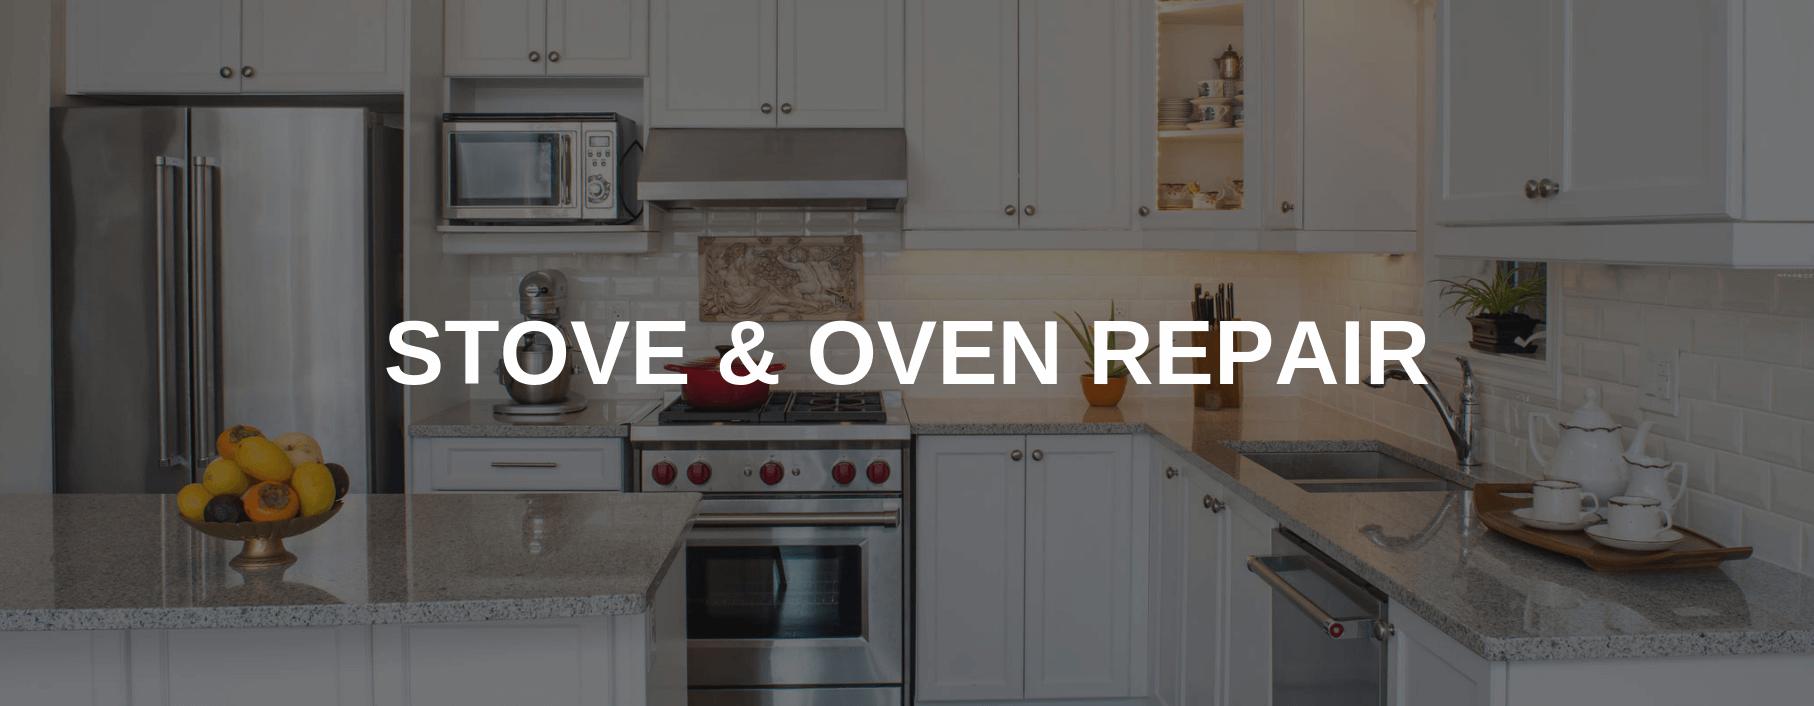 stove repair appliance repair icon